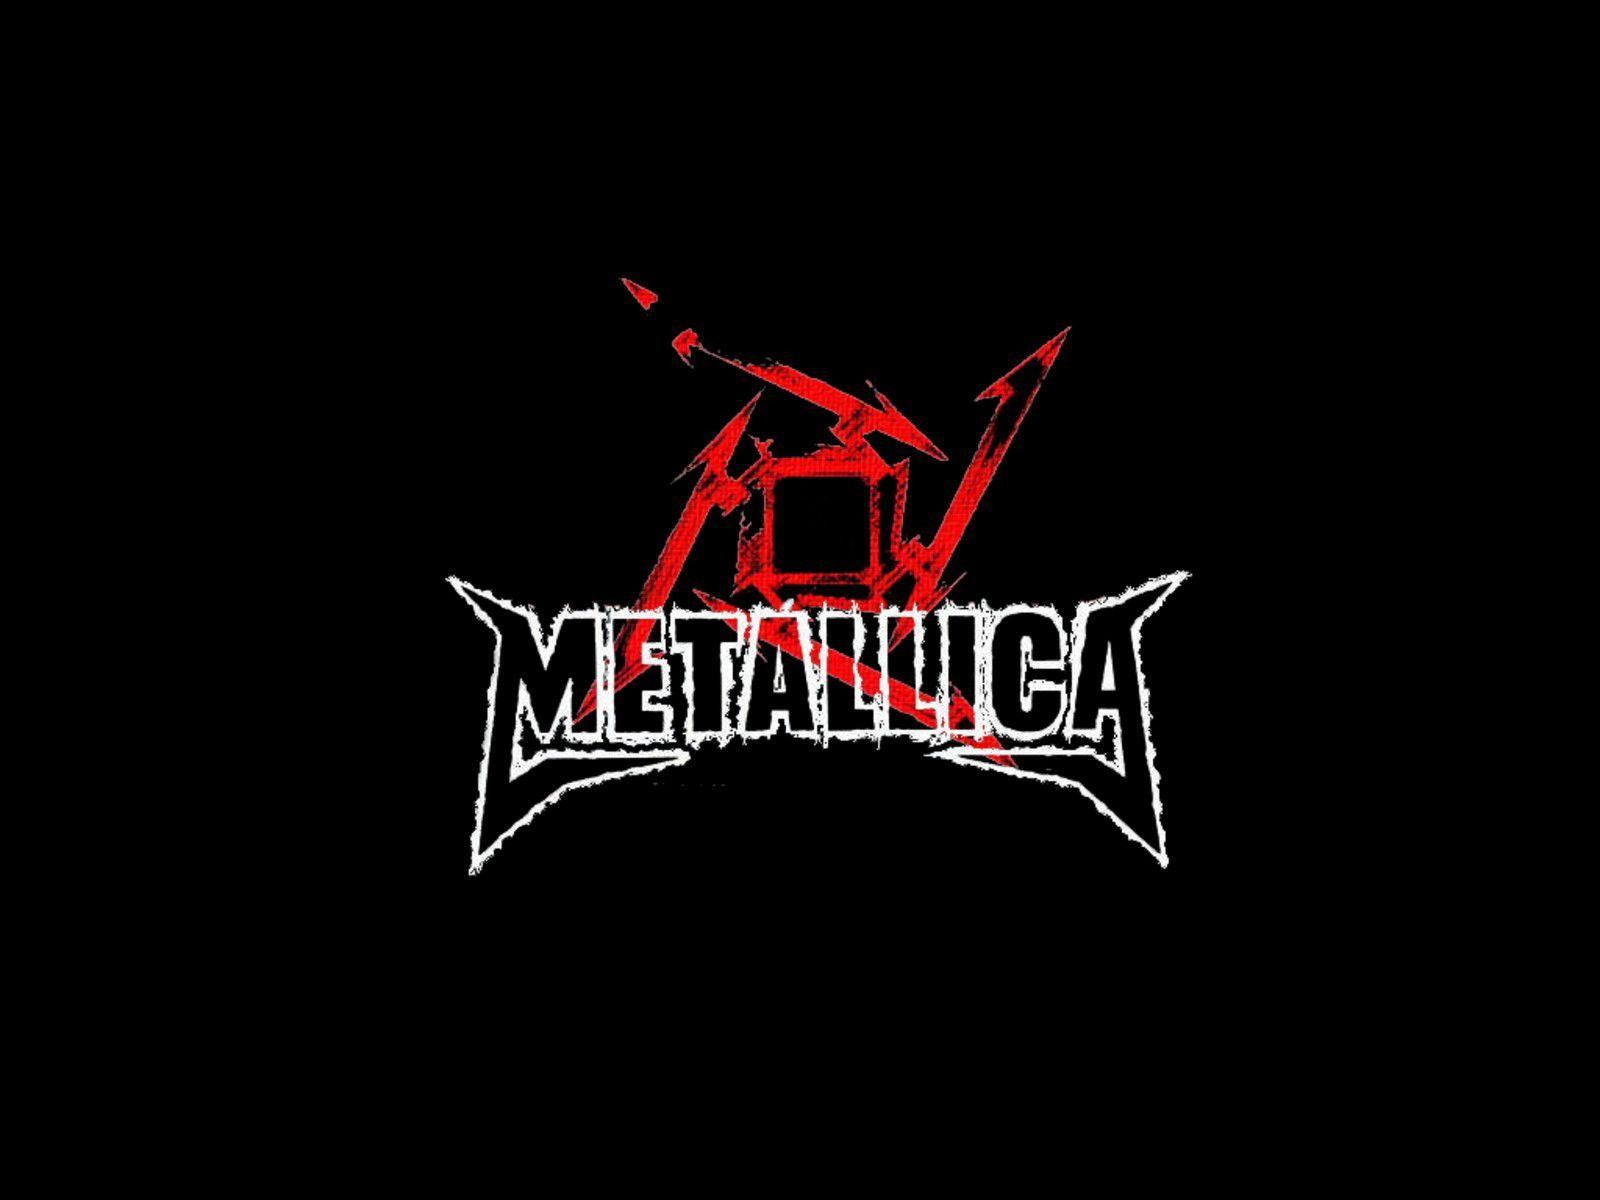 Metallica Backgrounds Wallpaper Cave